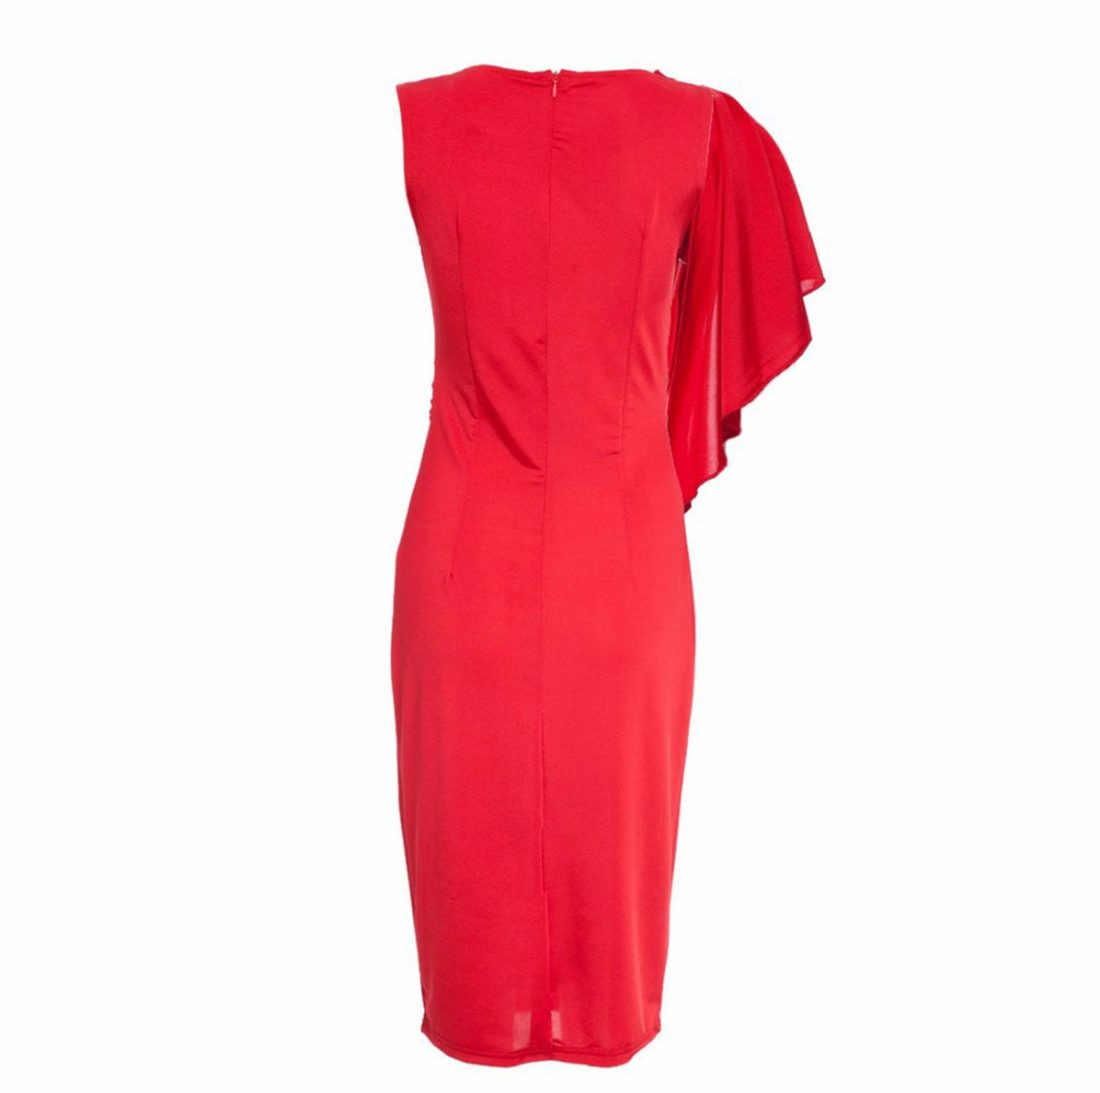 M0188 red6 Short Sleeve Dresses maureens.com boutique